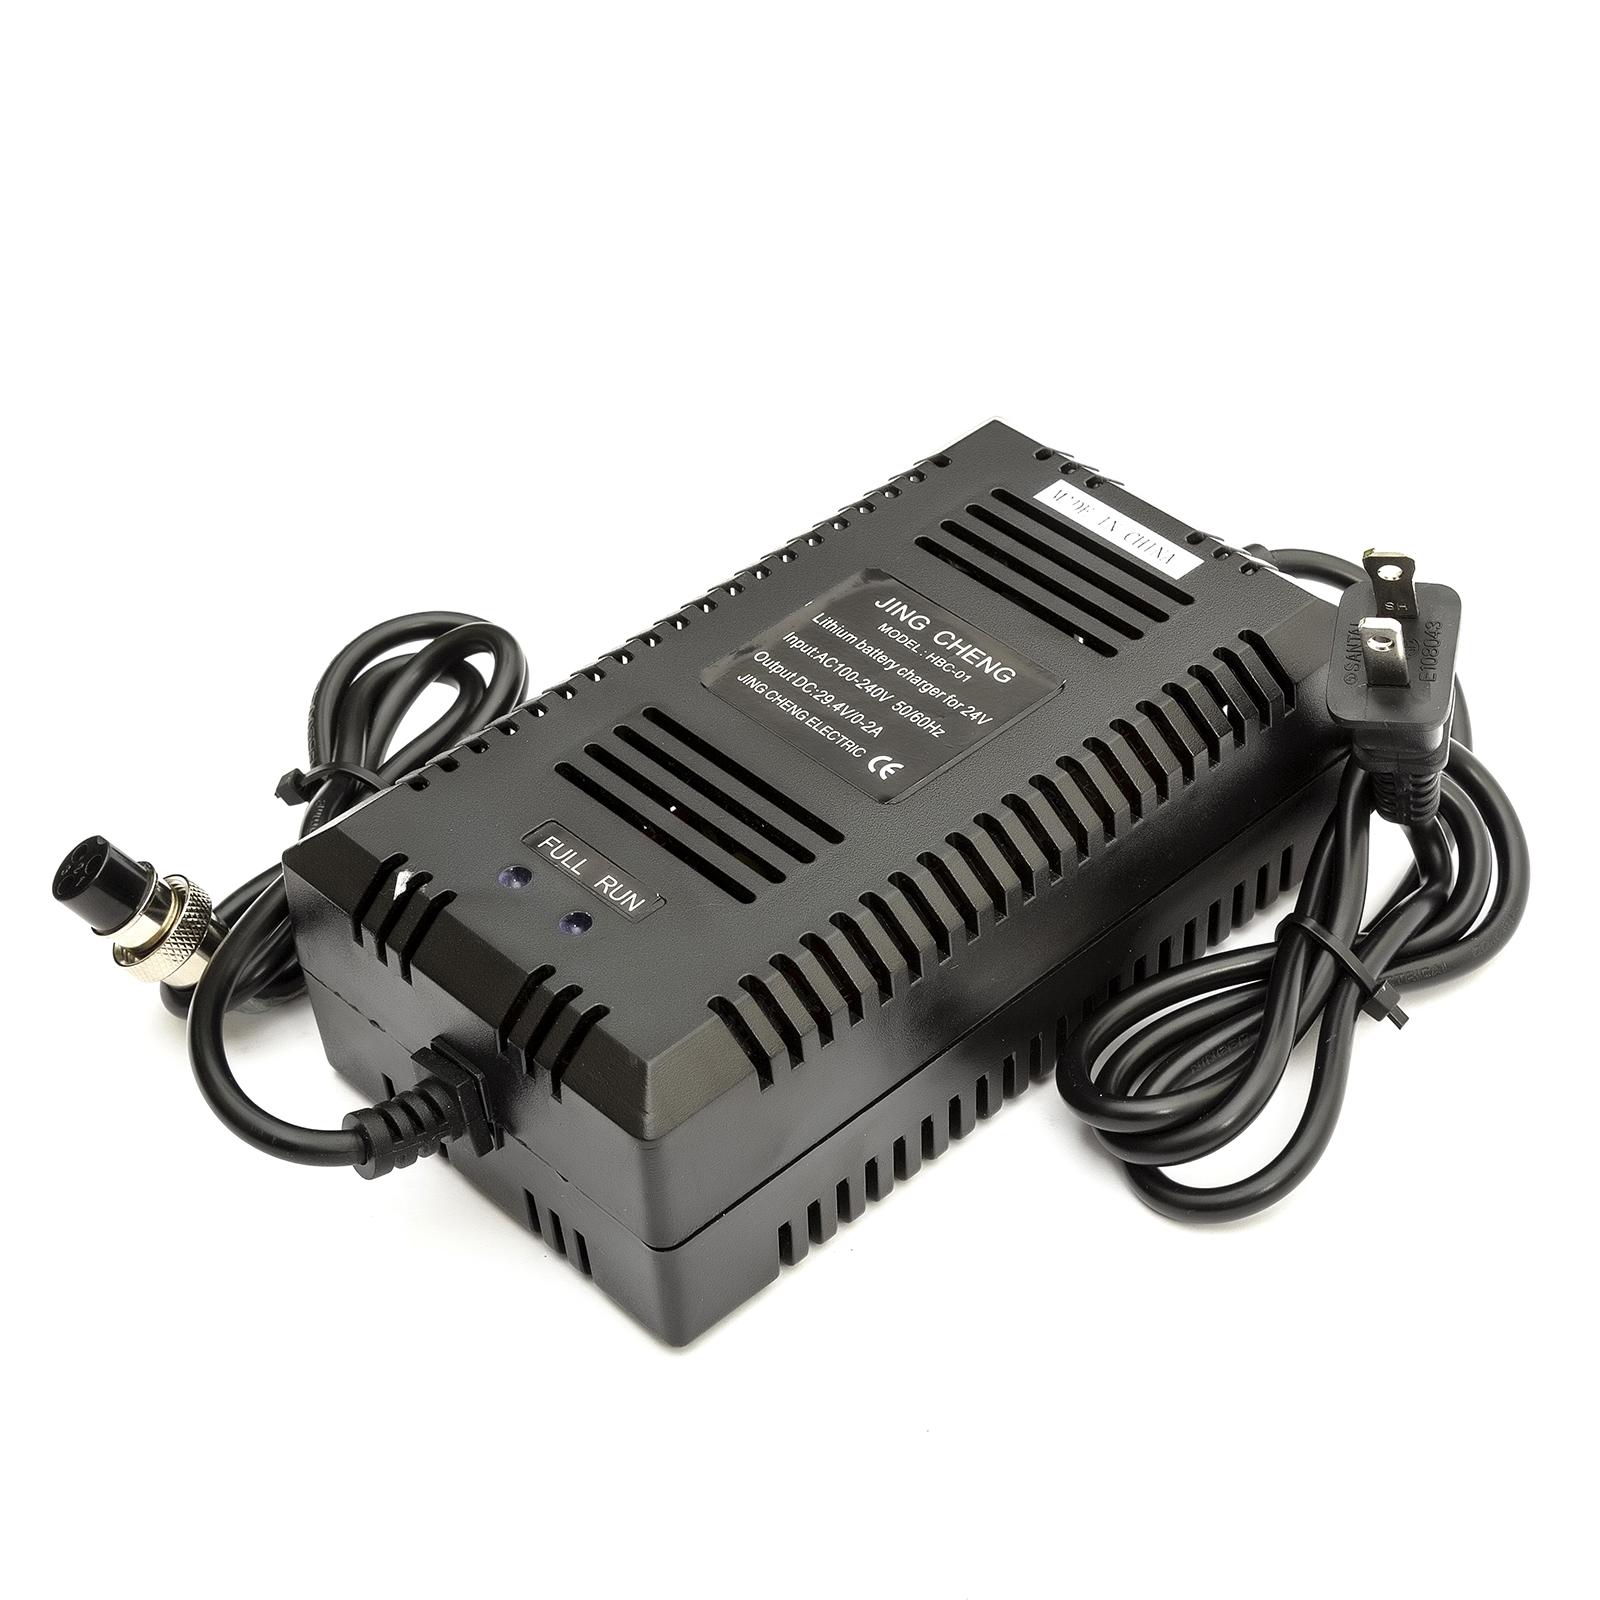 24v Usa Electric Scooter Battery Charger Razor E90 E100